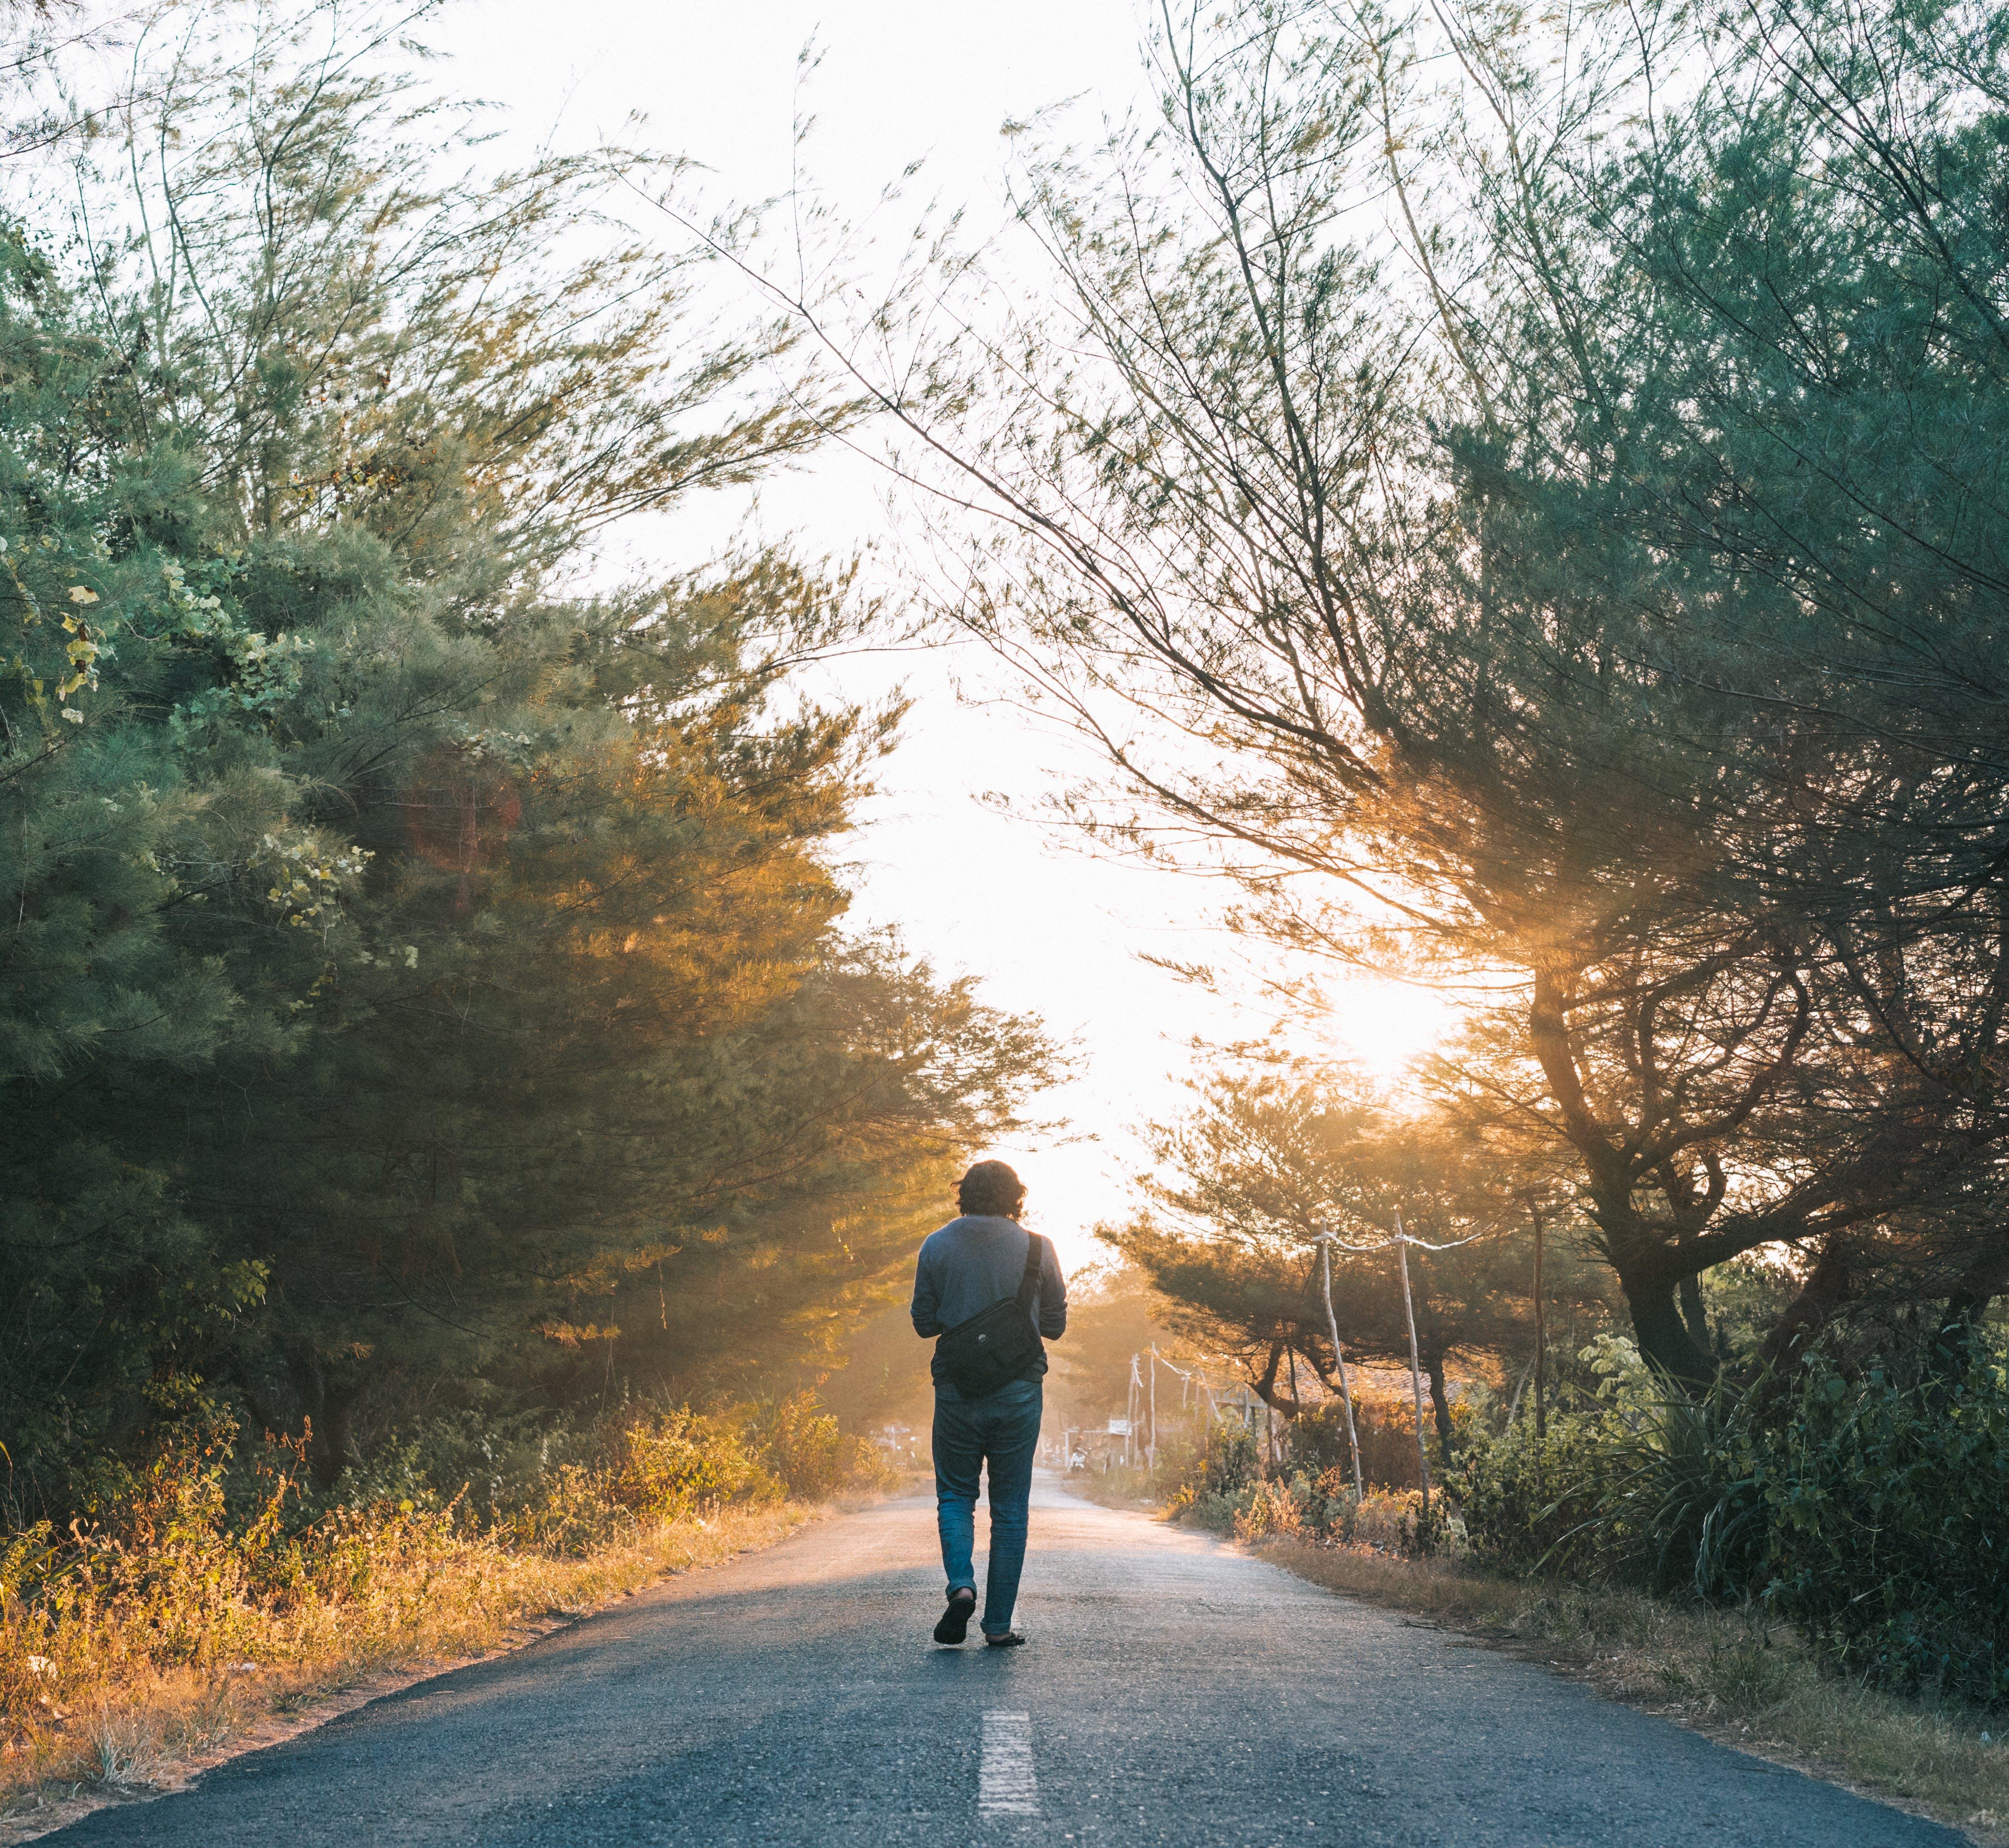 Man Walking on the Gray Asphalt Road